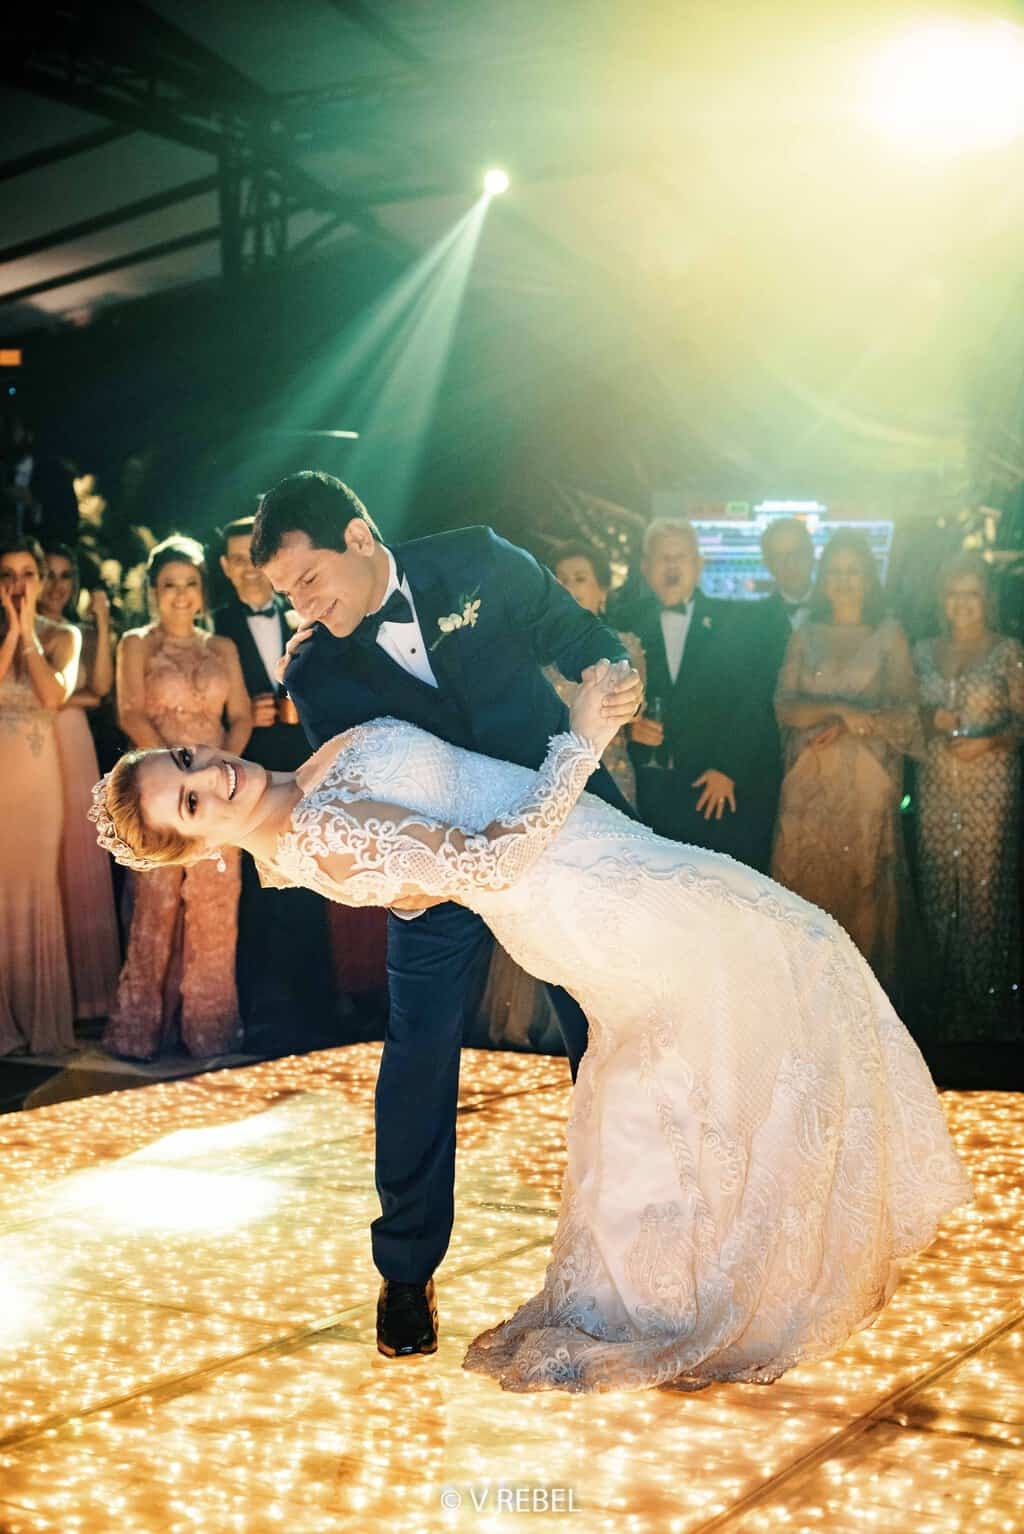 casamento-Caroline-e-Breno-casamento-clássico-foto-do-casal-fotografia-VRebel-noivos-na-pista-pista91